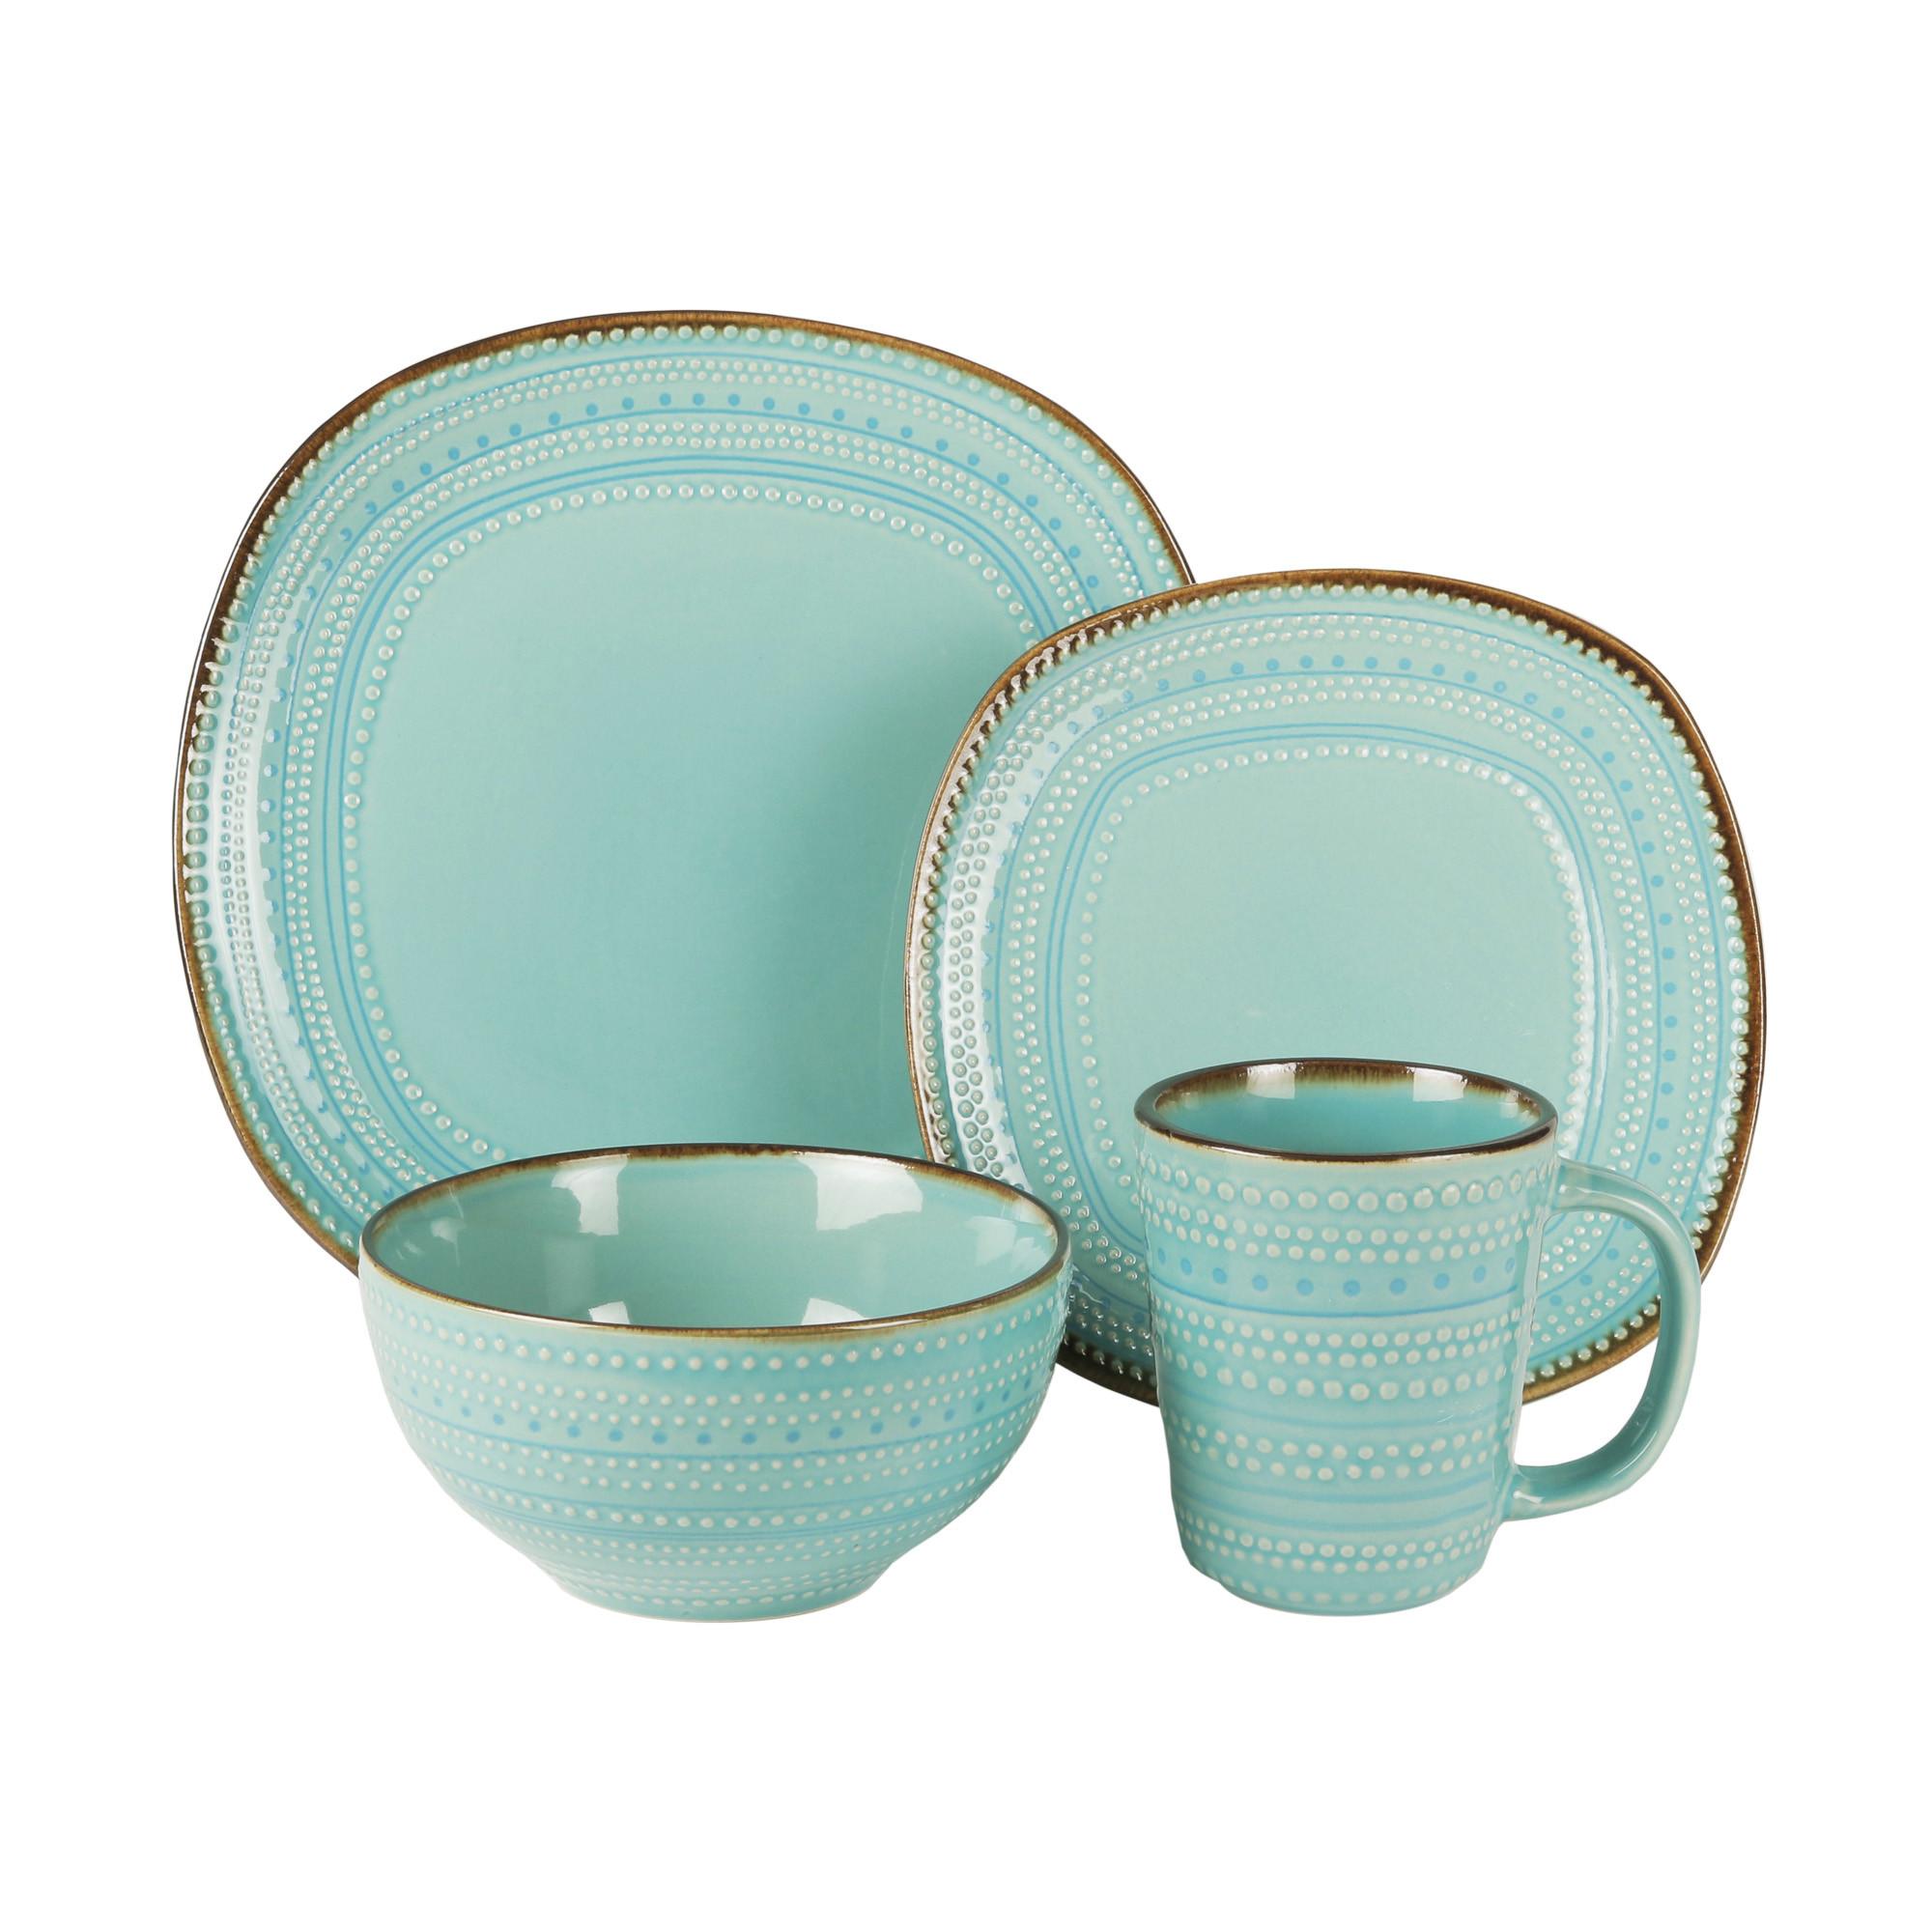 American Atelier Tallulah 16 Piece Dinnerware Set